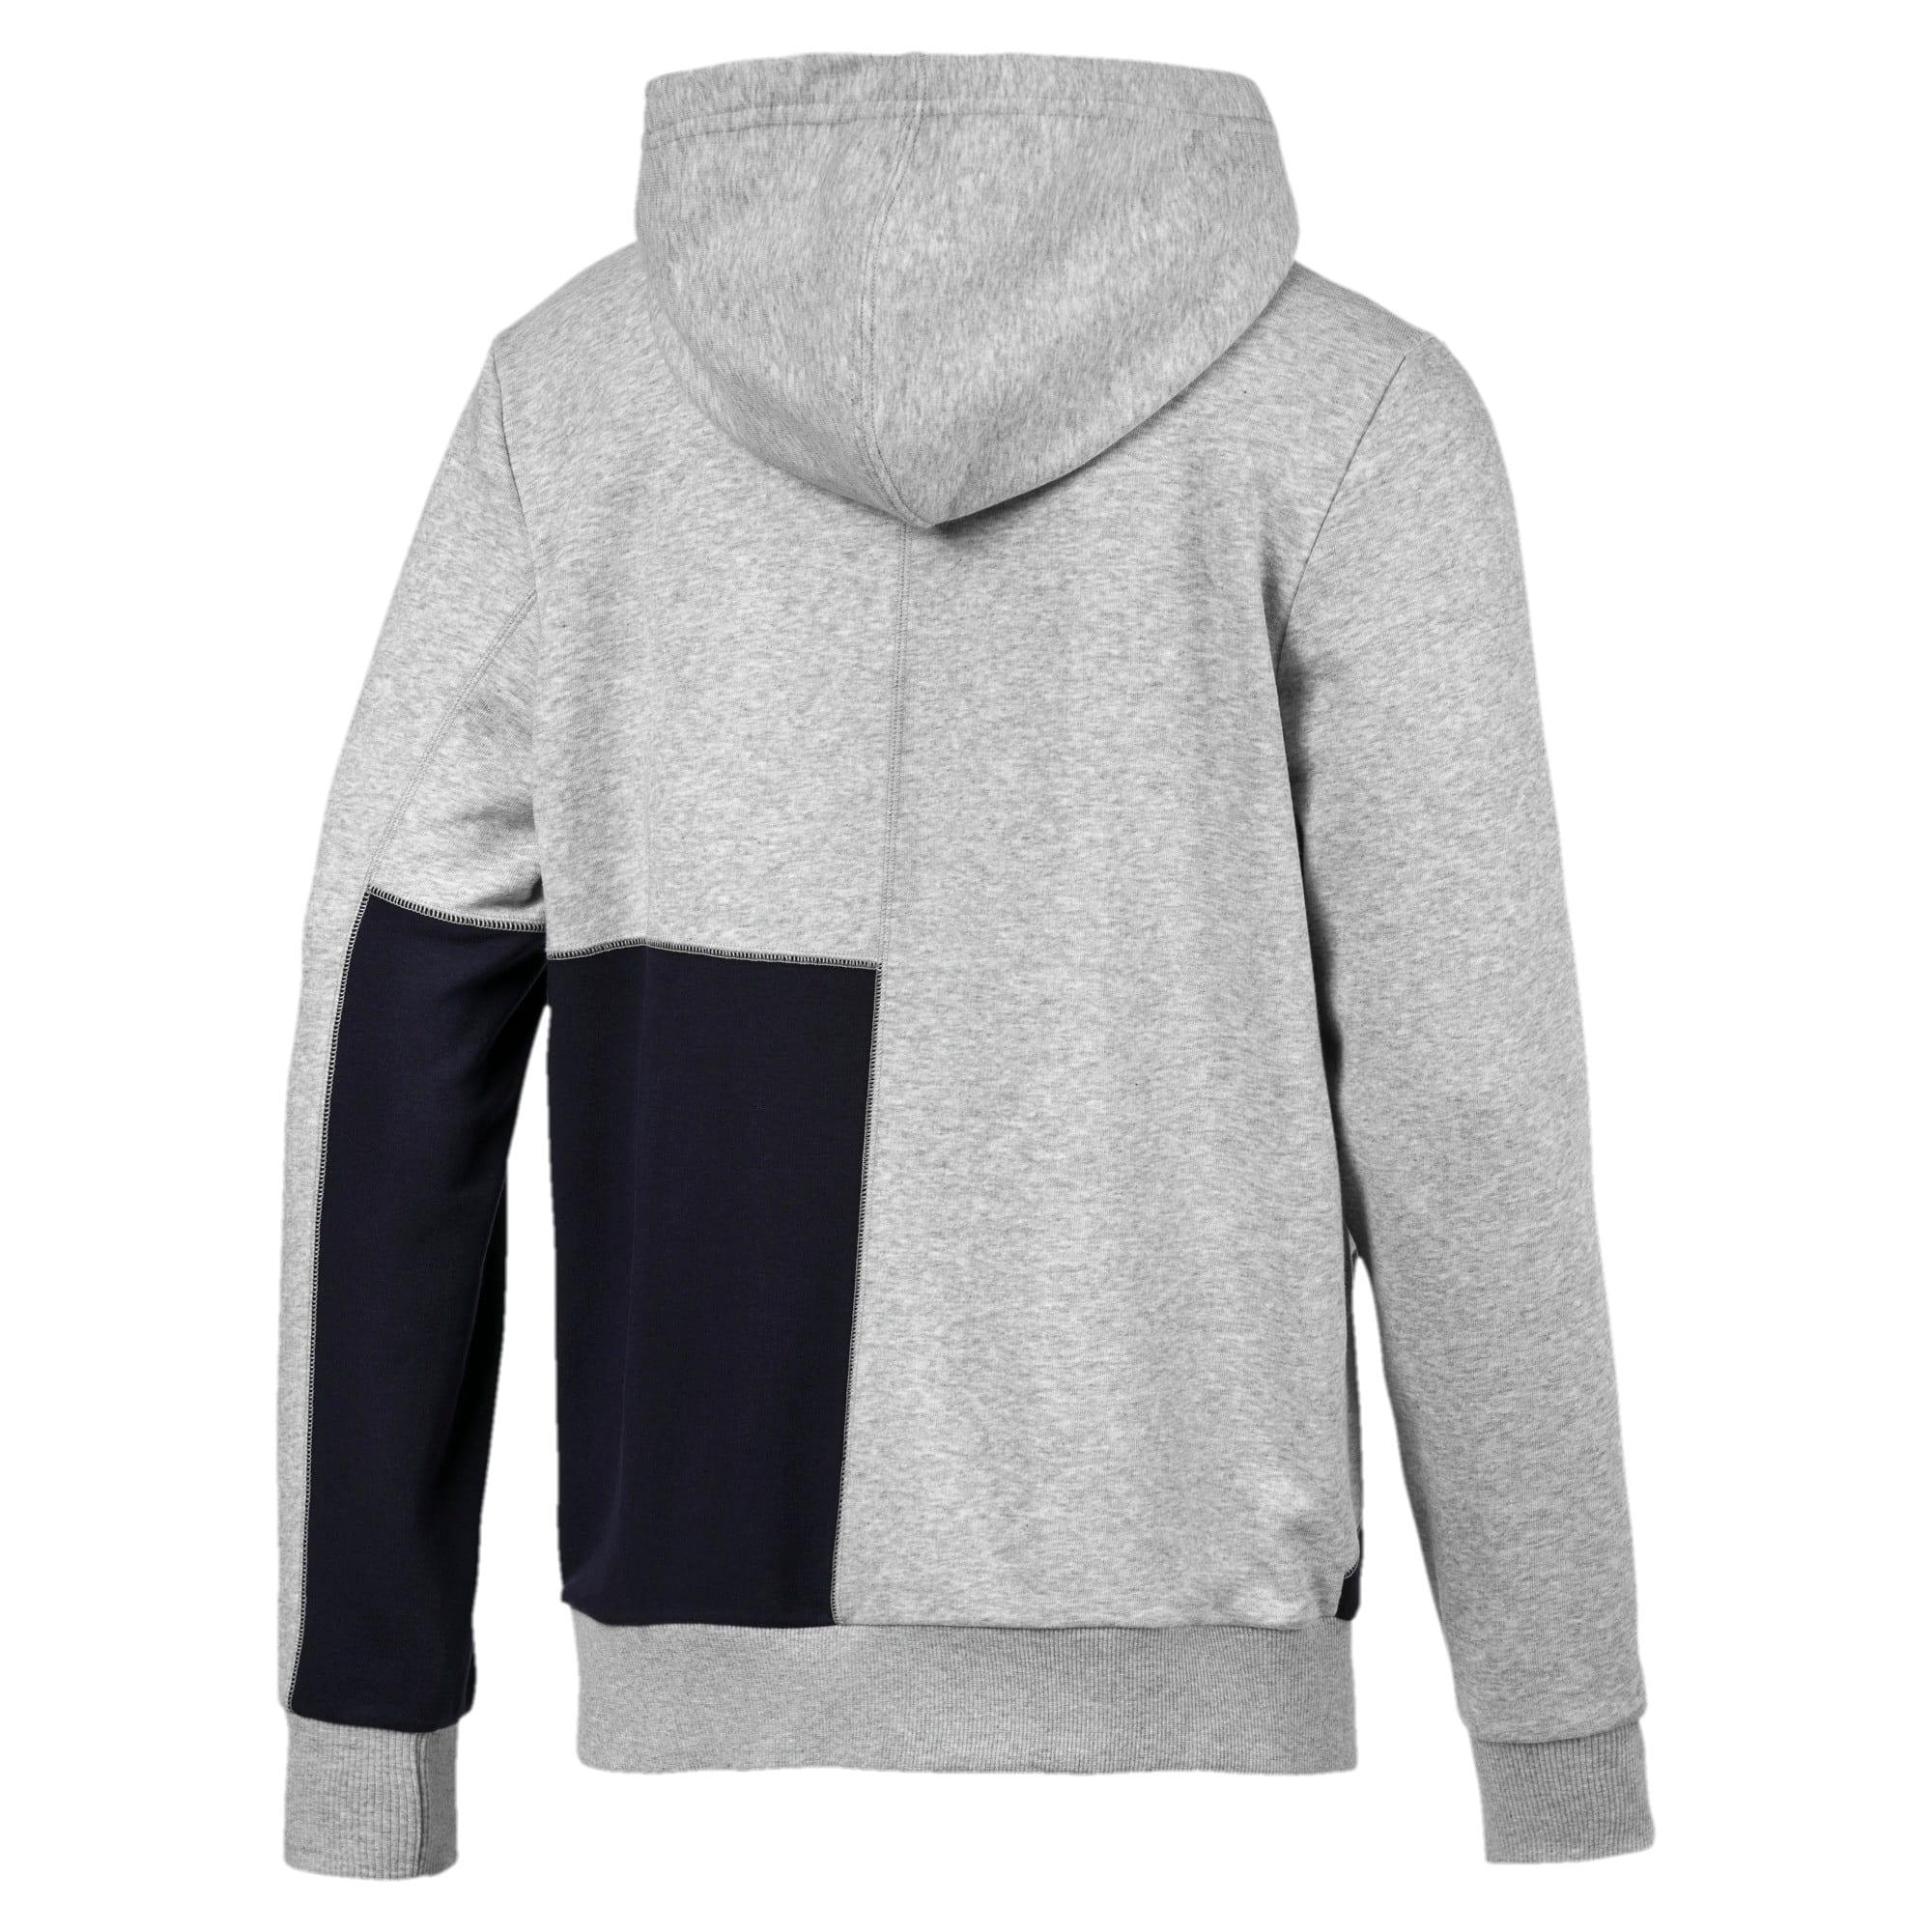 Thumbnail 6 of RBR Logo Hooded Men's Sweat Jacket, Light Gray Heather, medium